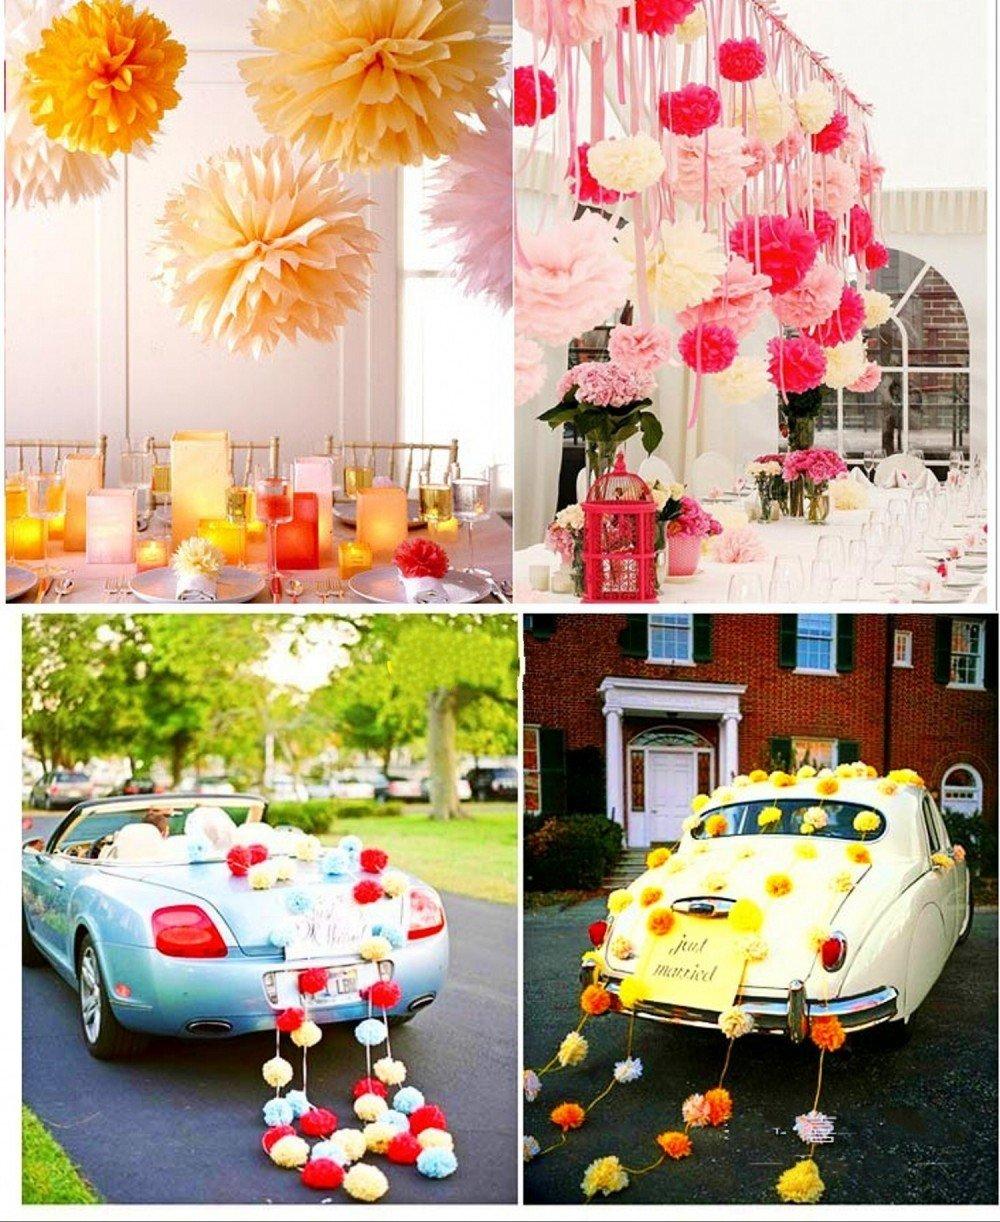 JZK 10 Cachi arancio chiaro pom pom carta velina 25 cm decorazioni festone per matrimonio compleanno Natale Halloween laurea addobbi pompon pon pon pompom